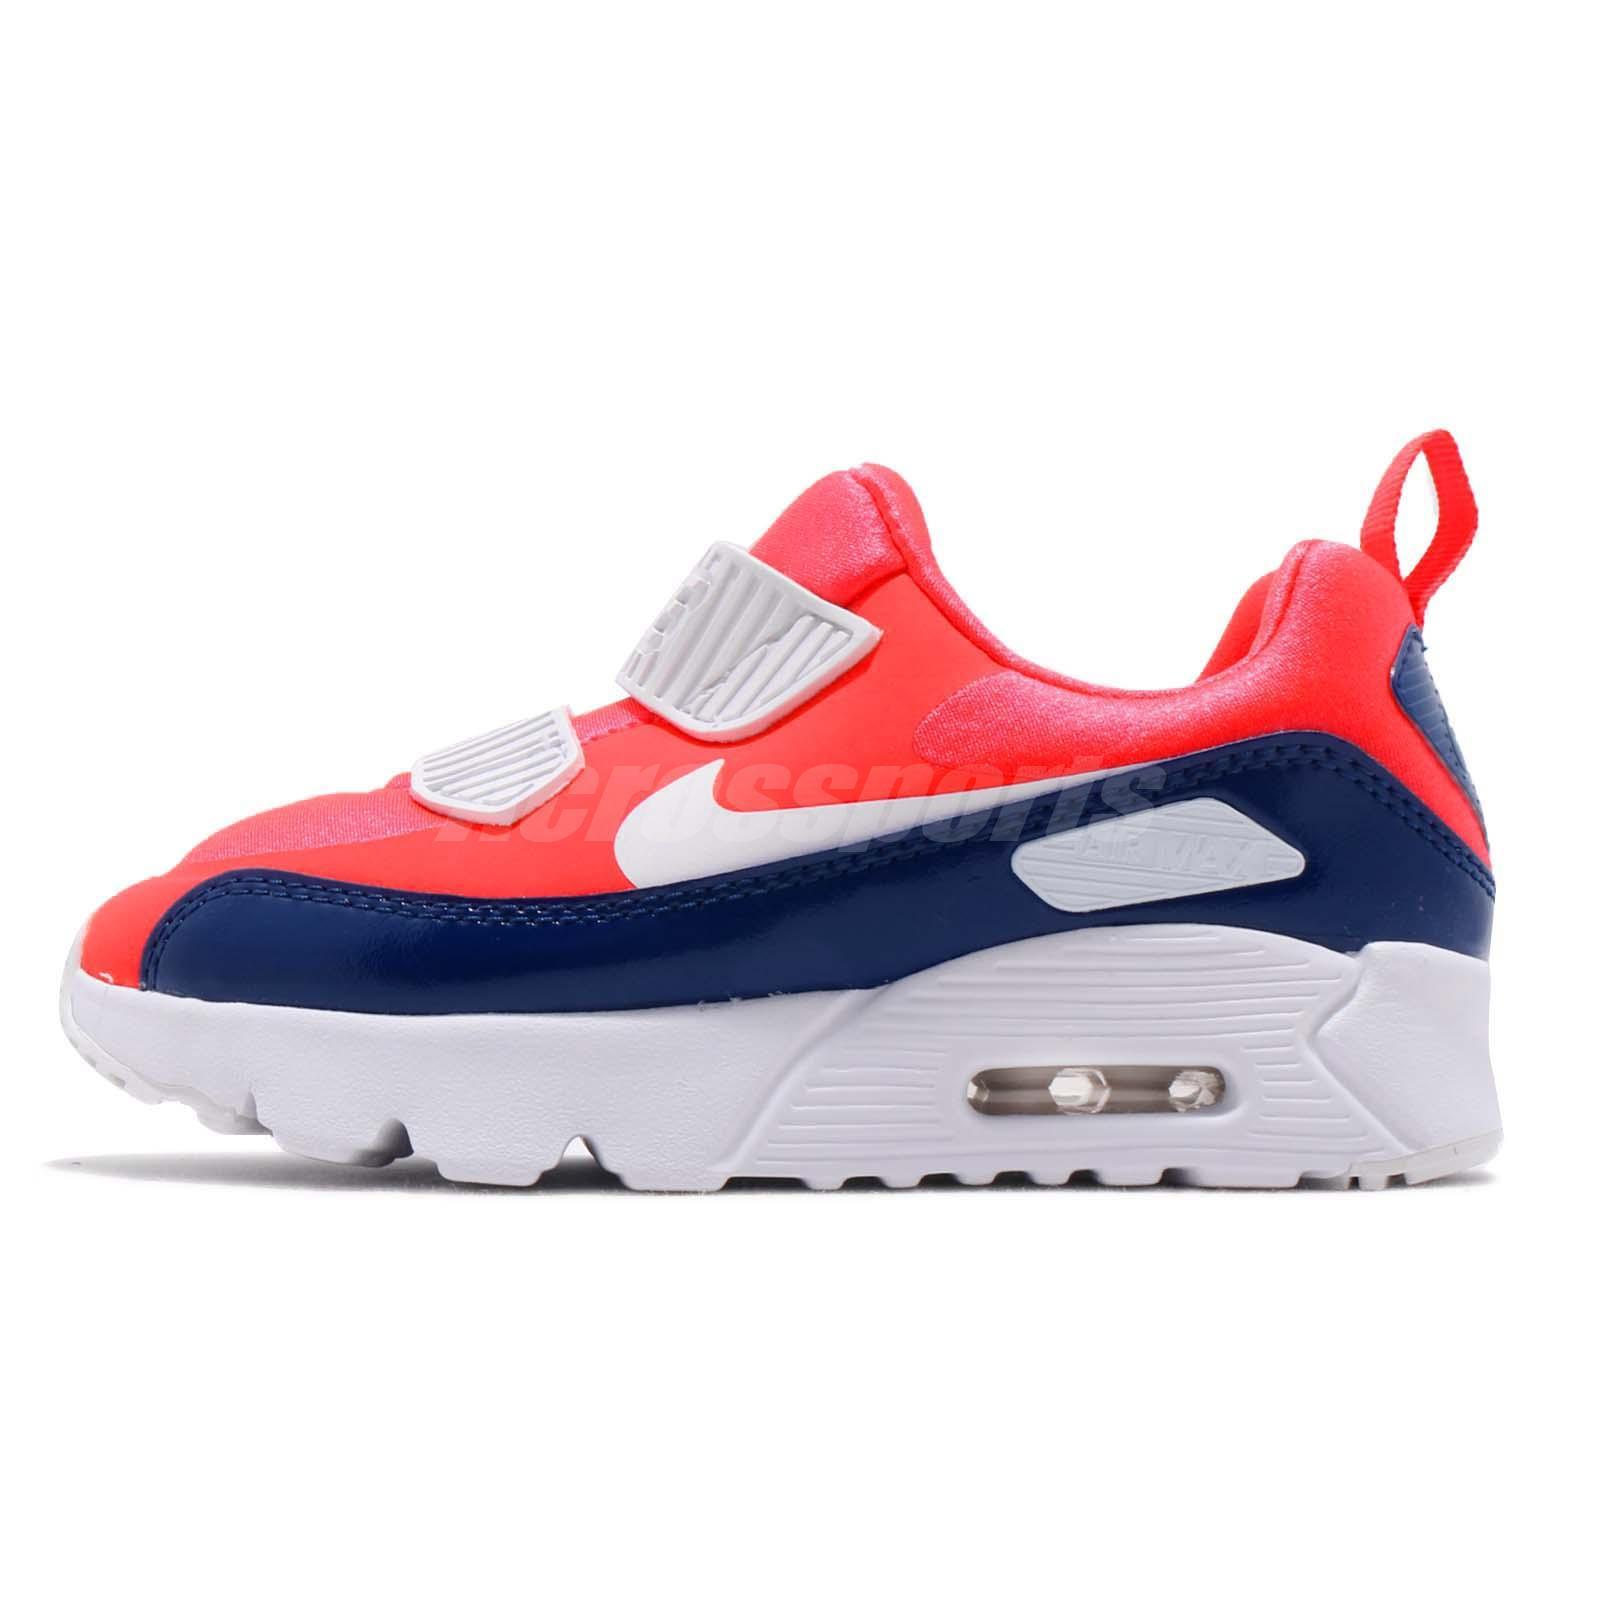 best service d3dc8 f0e8a Nike Air Max Tiny 90 PS Bright Crimson Kid Preschool Slip On Shoes 881927- 604